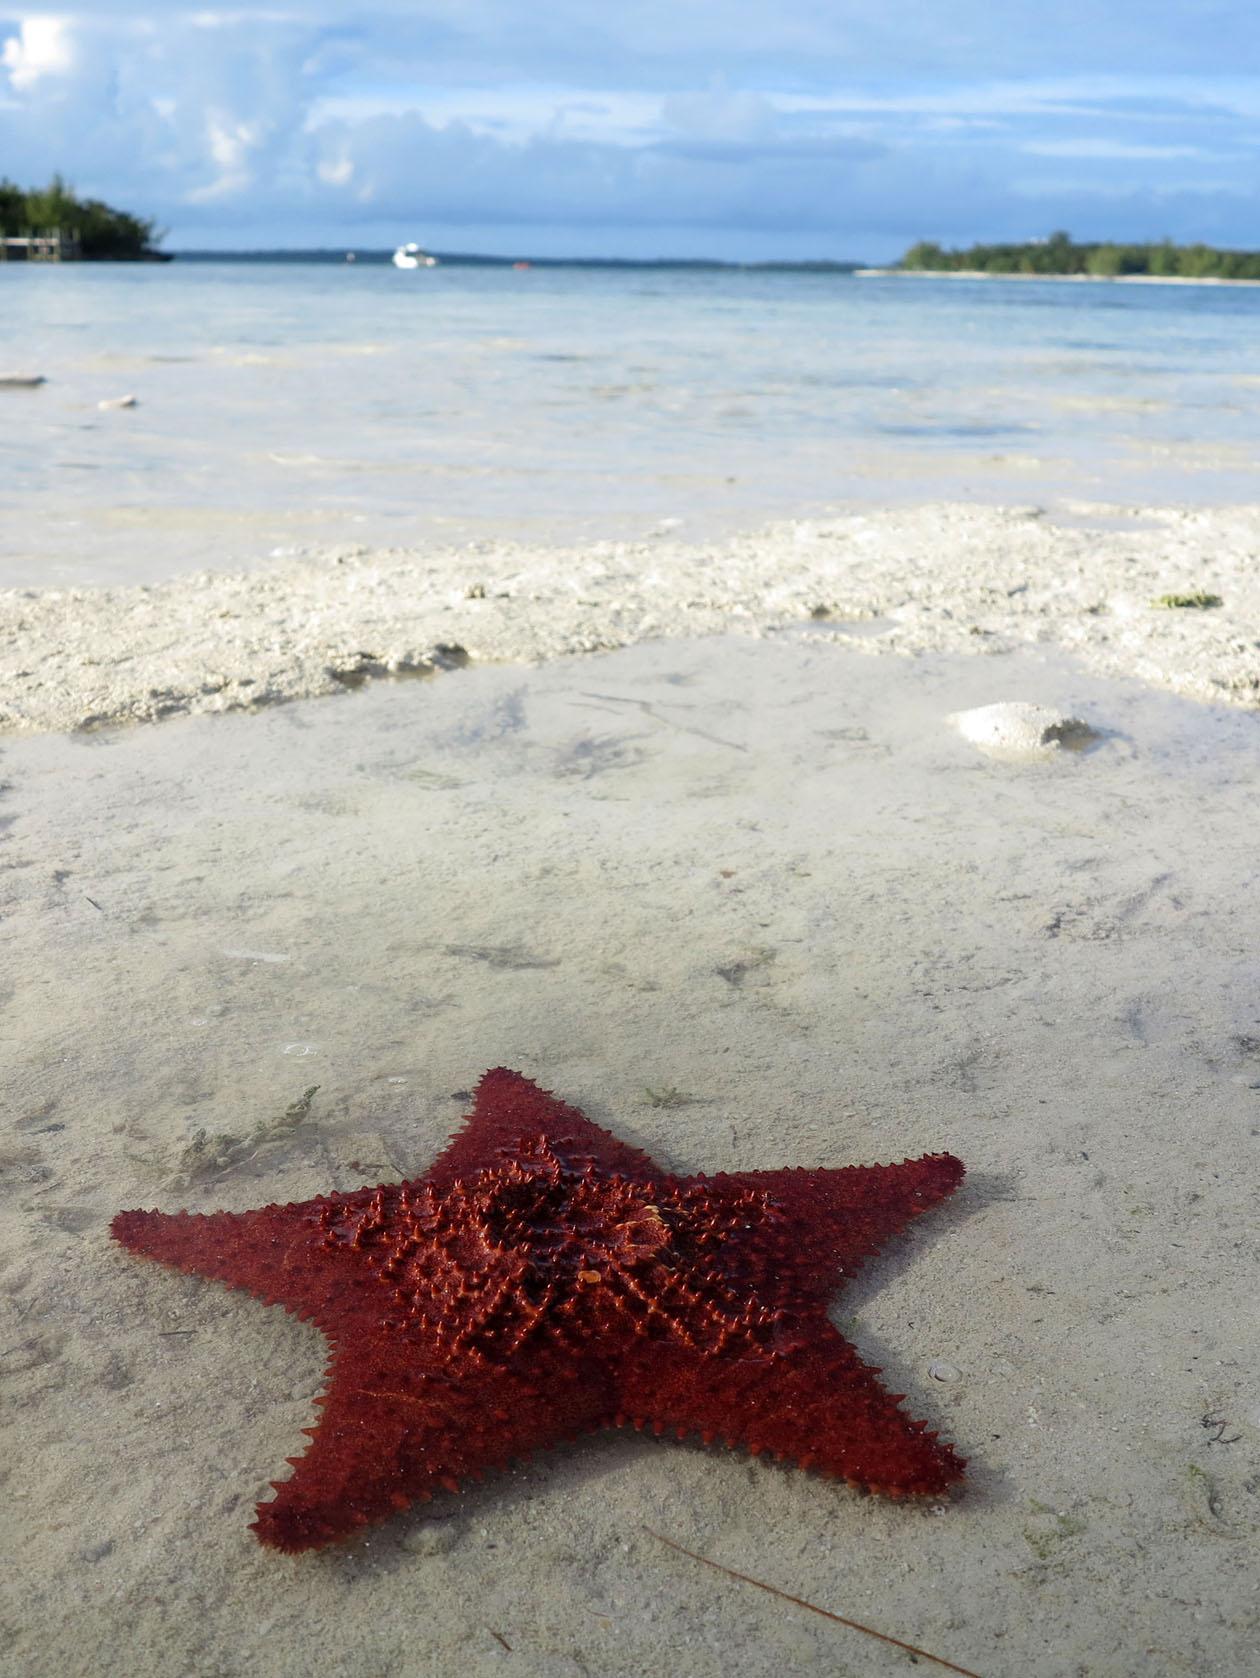 bahamas, abaco, green turtle cay, starfish, coco bay